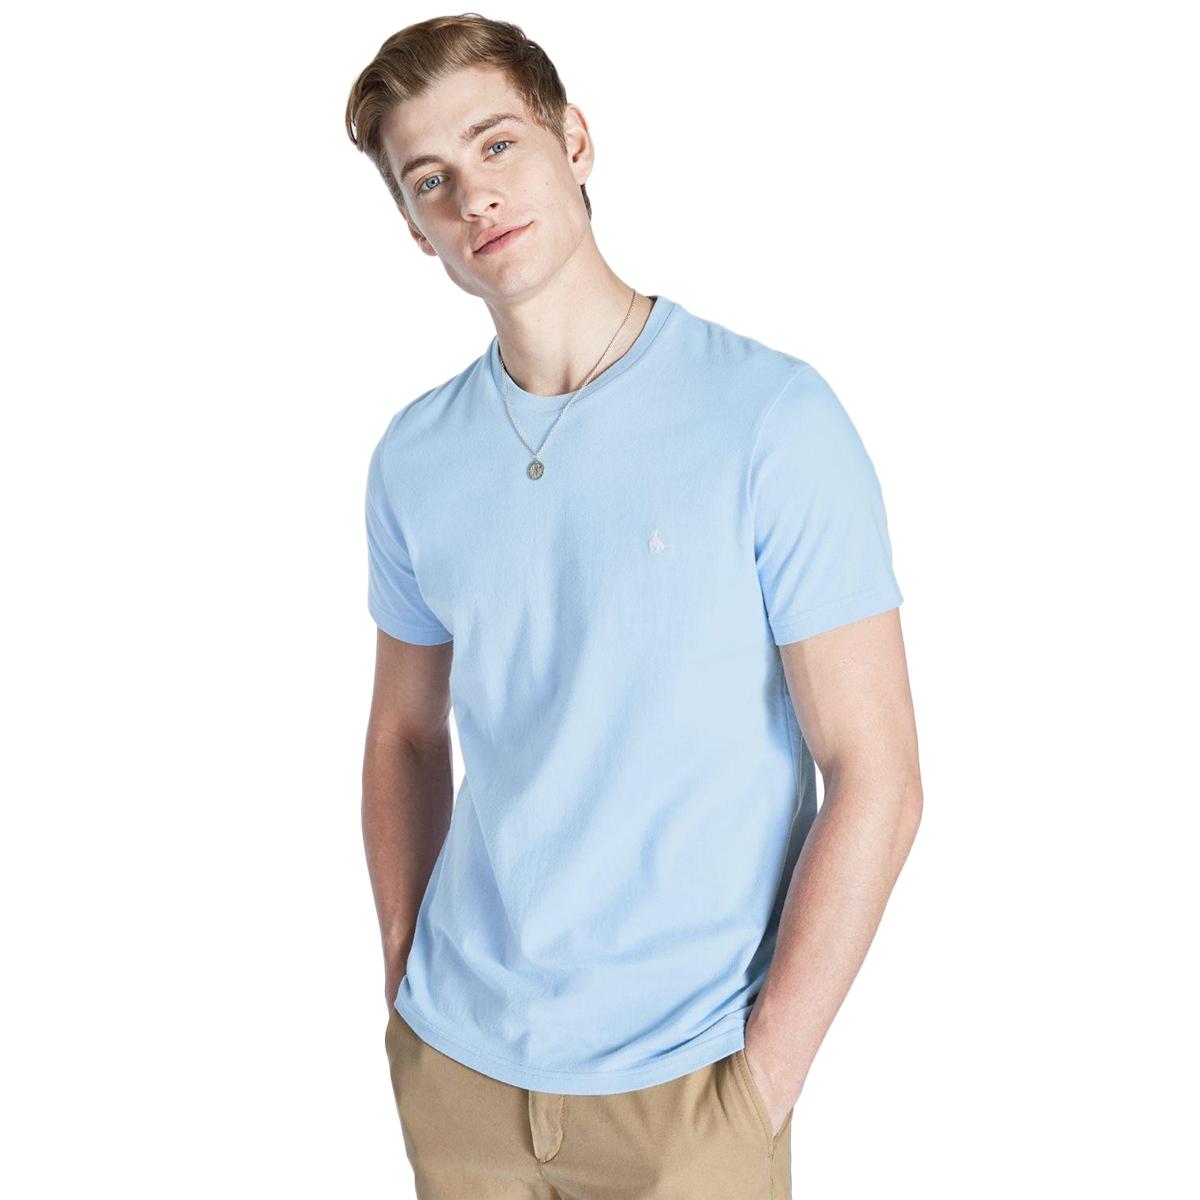 Jack Wills Men's Sandleford Short-Sleeve Tee - Blue, M